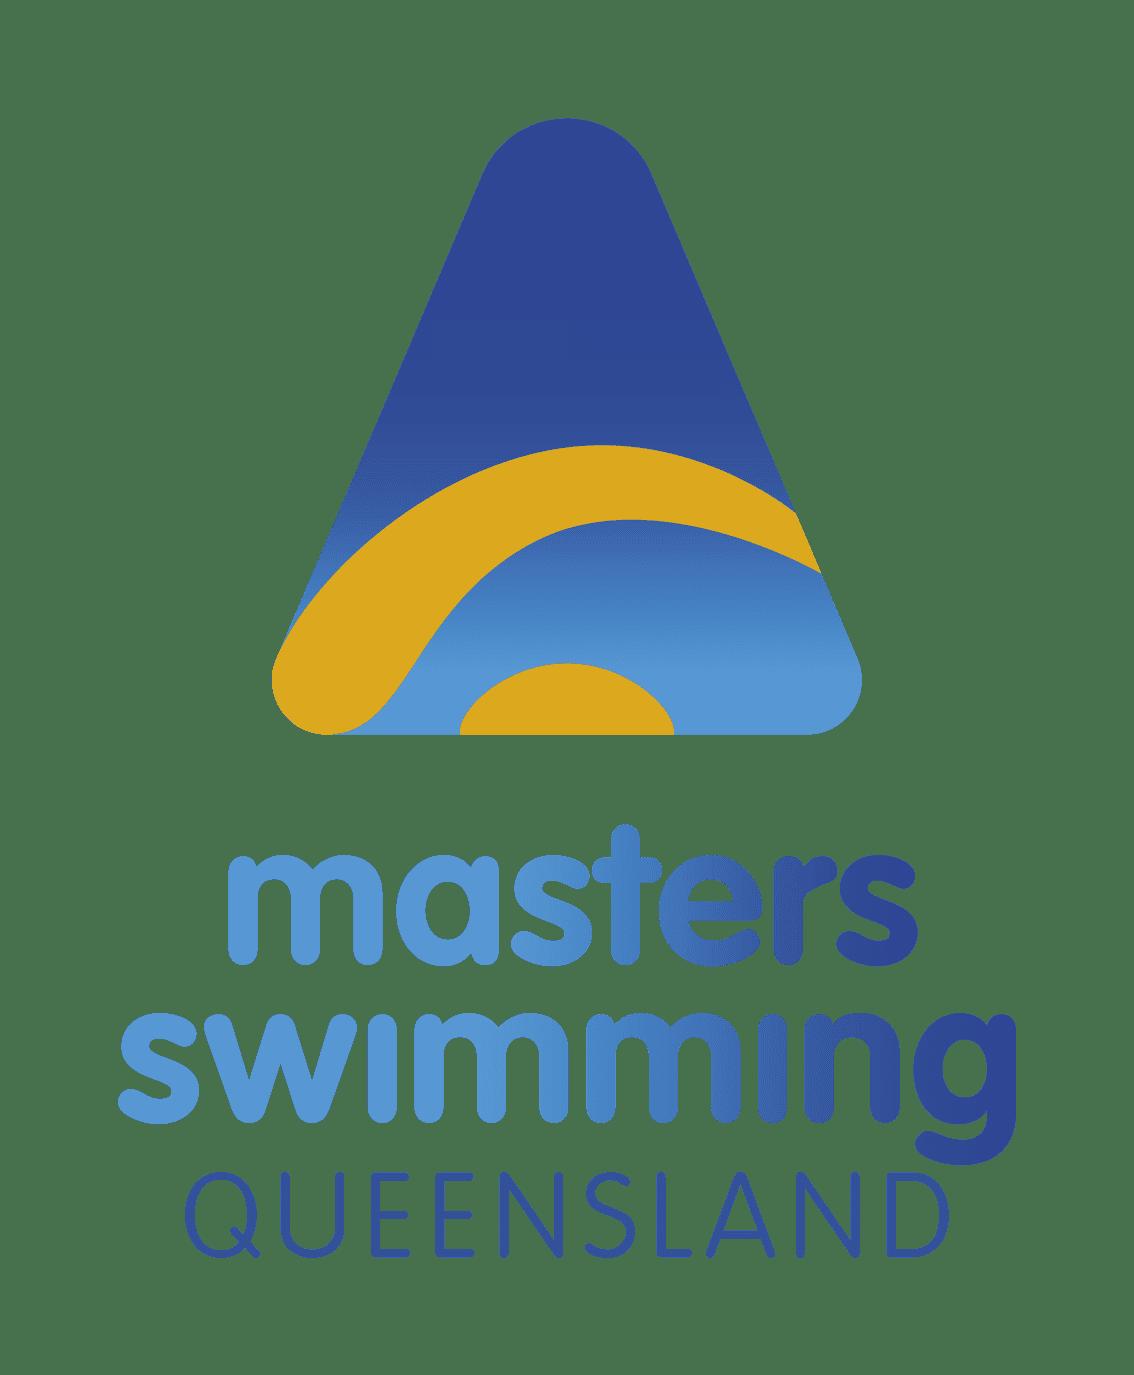 Masters Swimming QLD